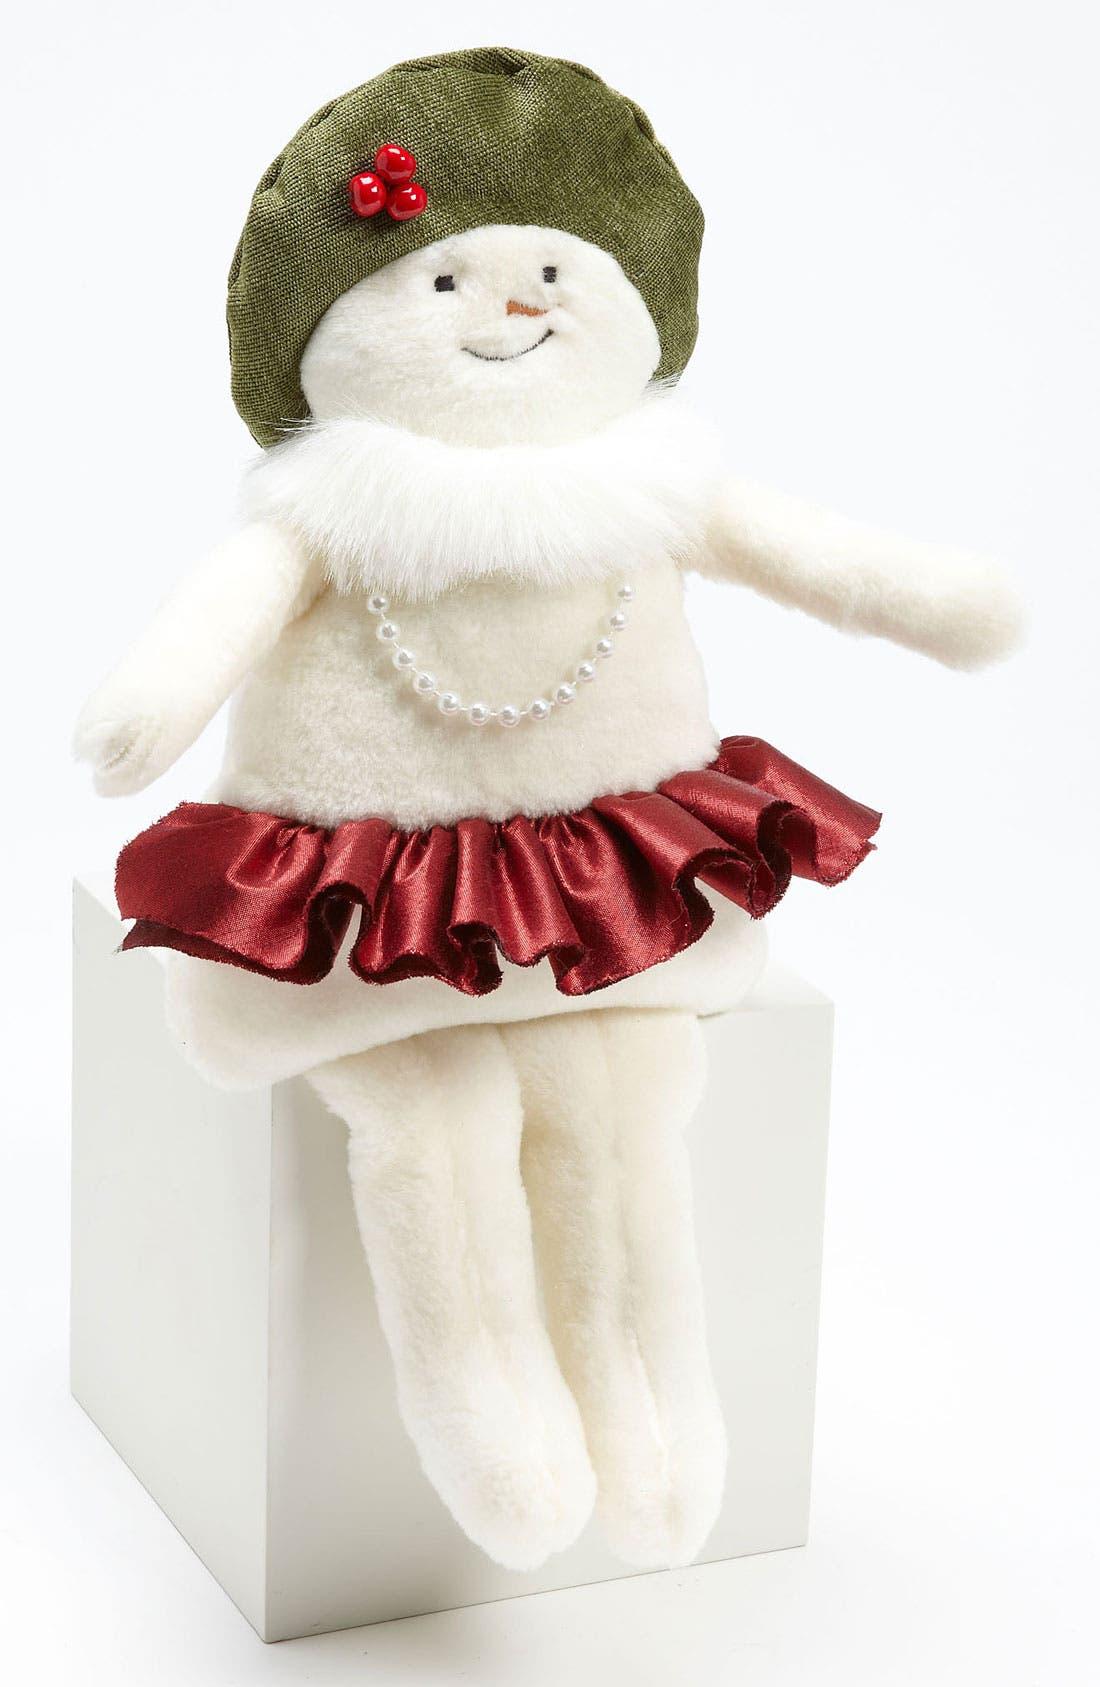 Alternate Image 1 Selected - Woof & Poof Small Snowgirl Bean Bag